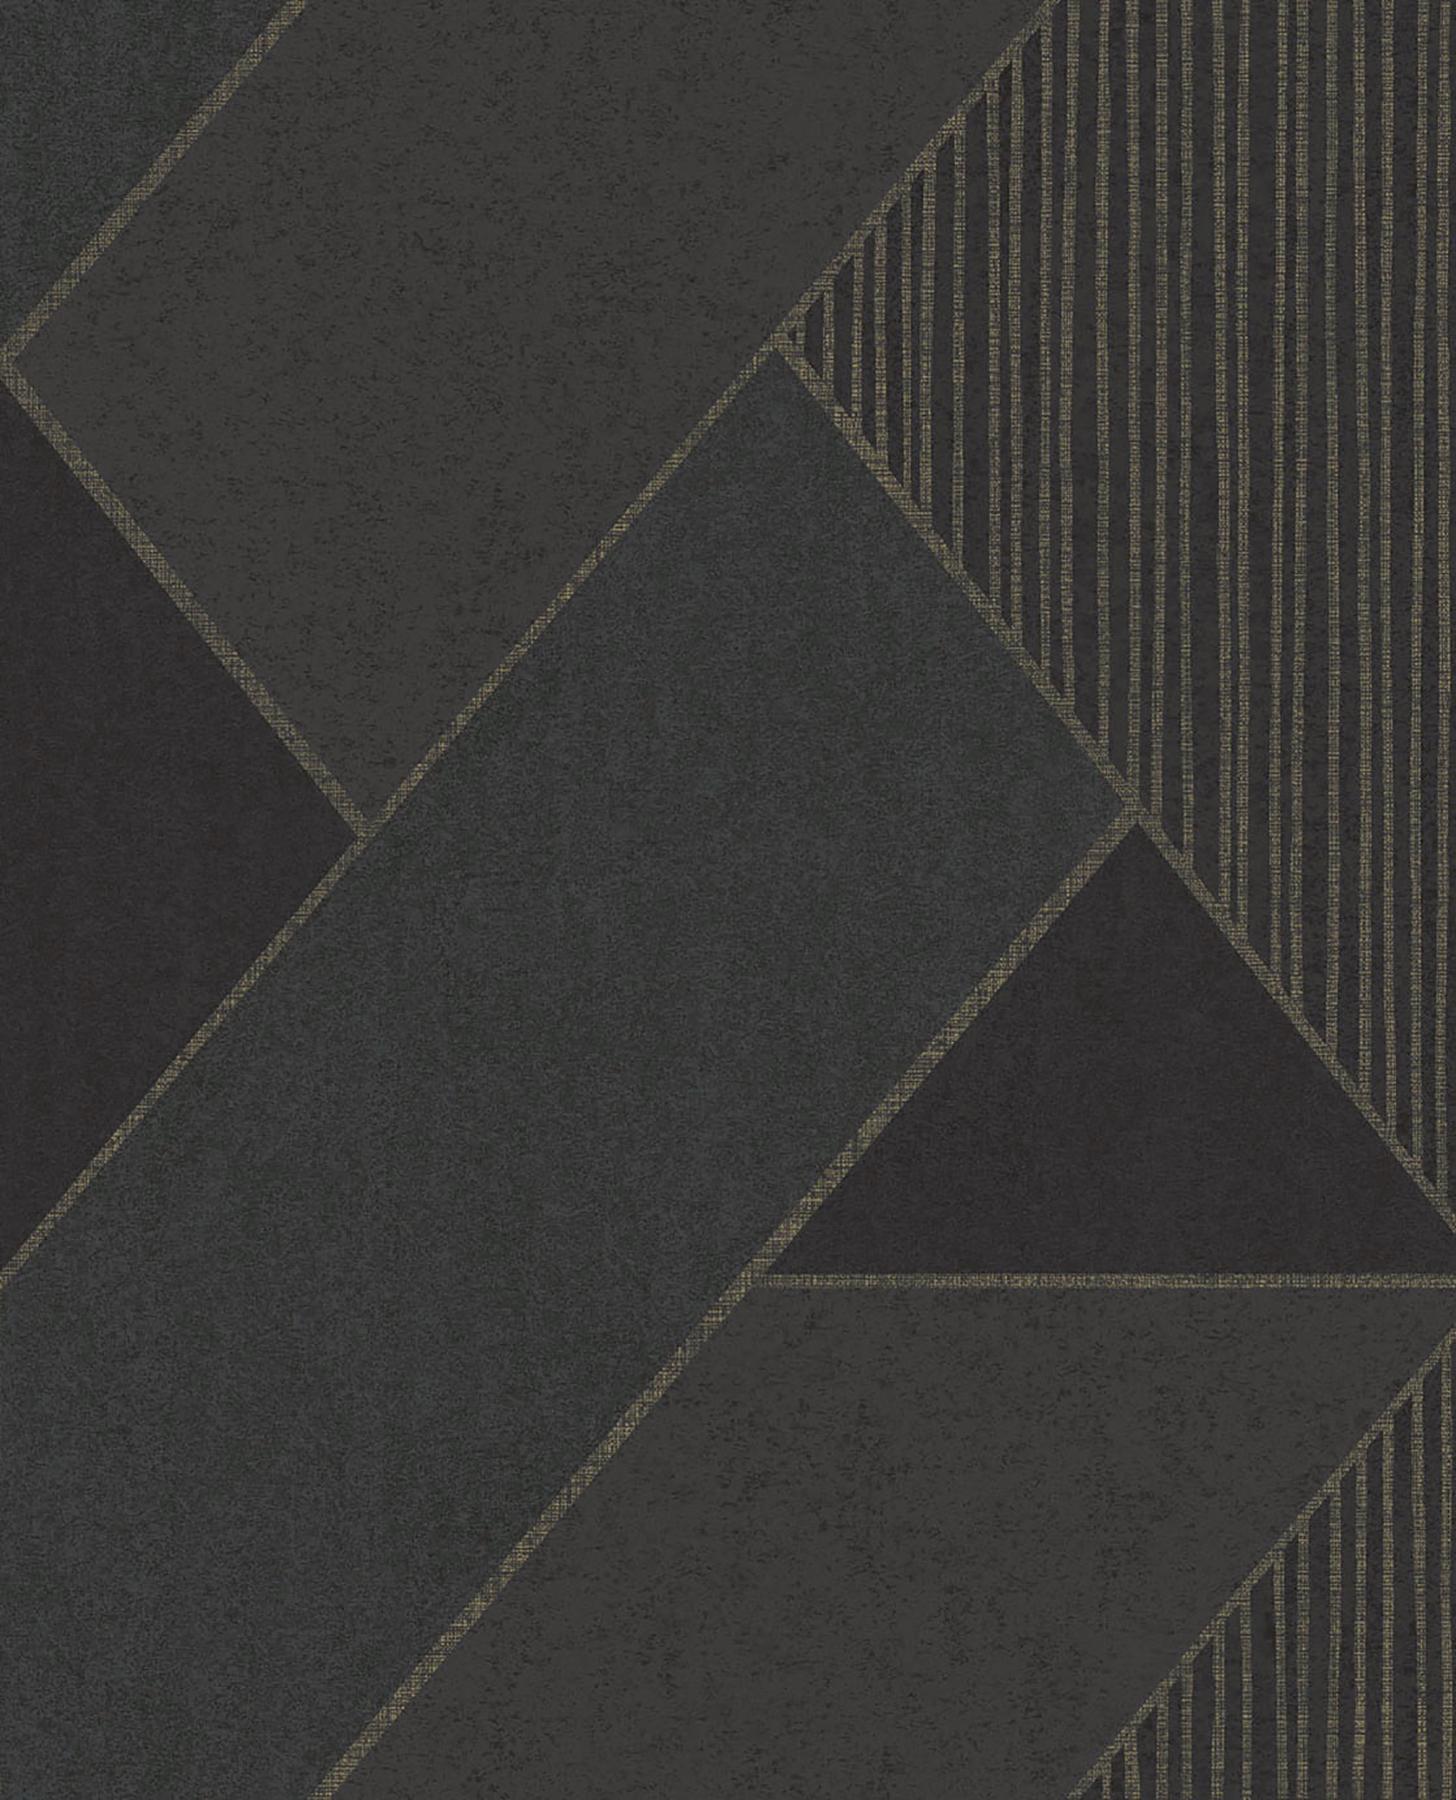 Picture of Art Deco Dark Blue Glam Geometric Wallpaper